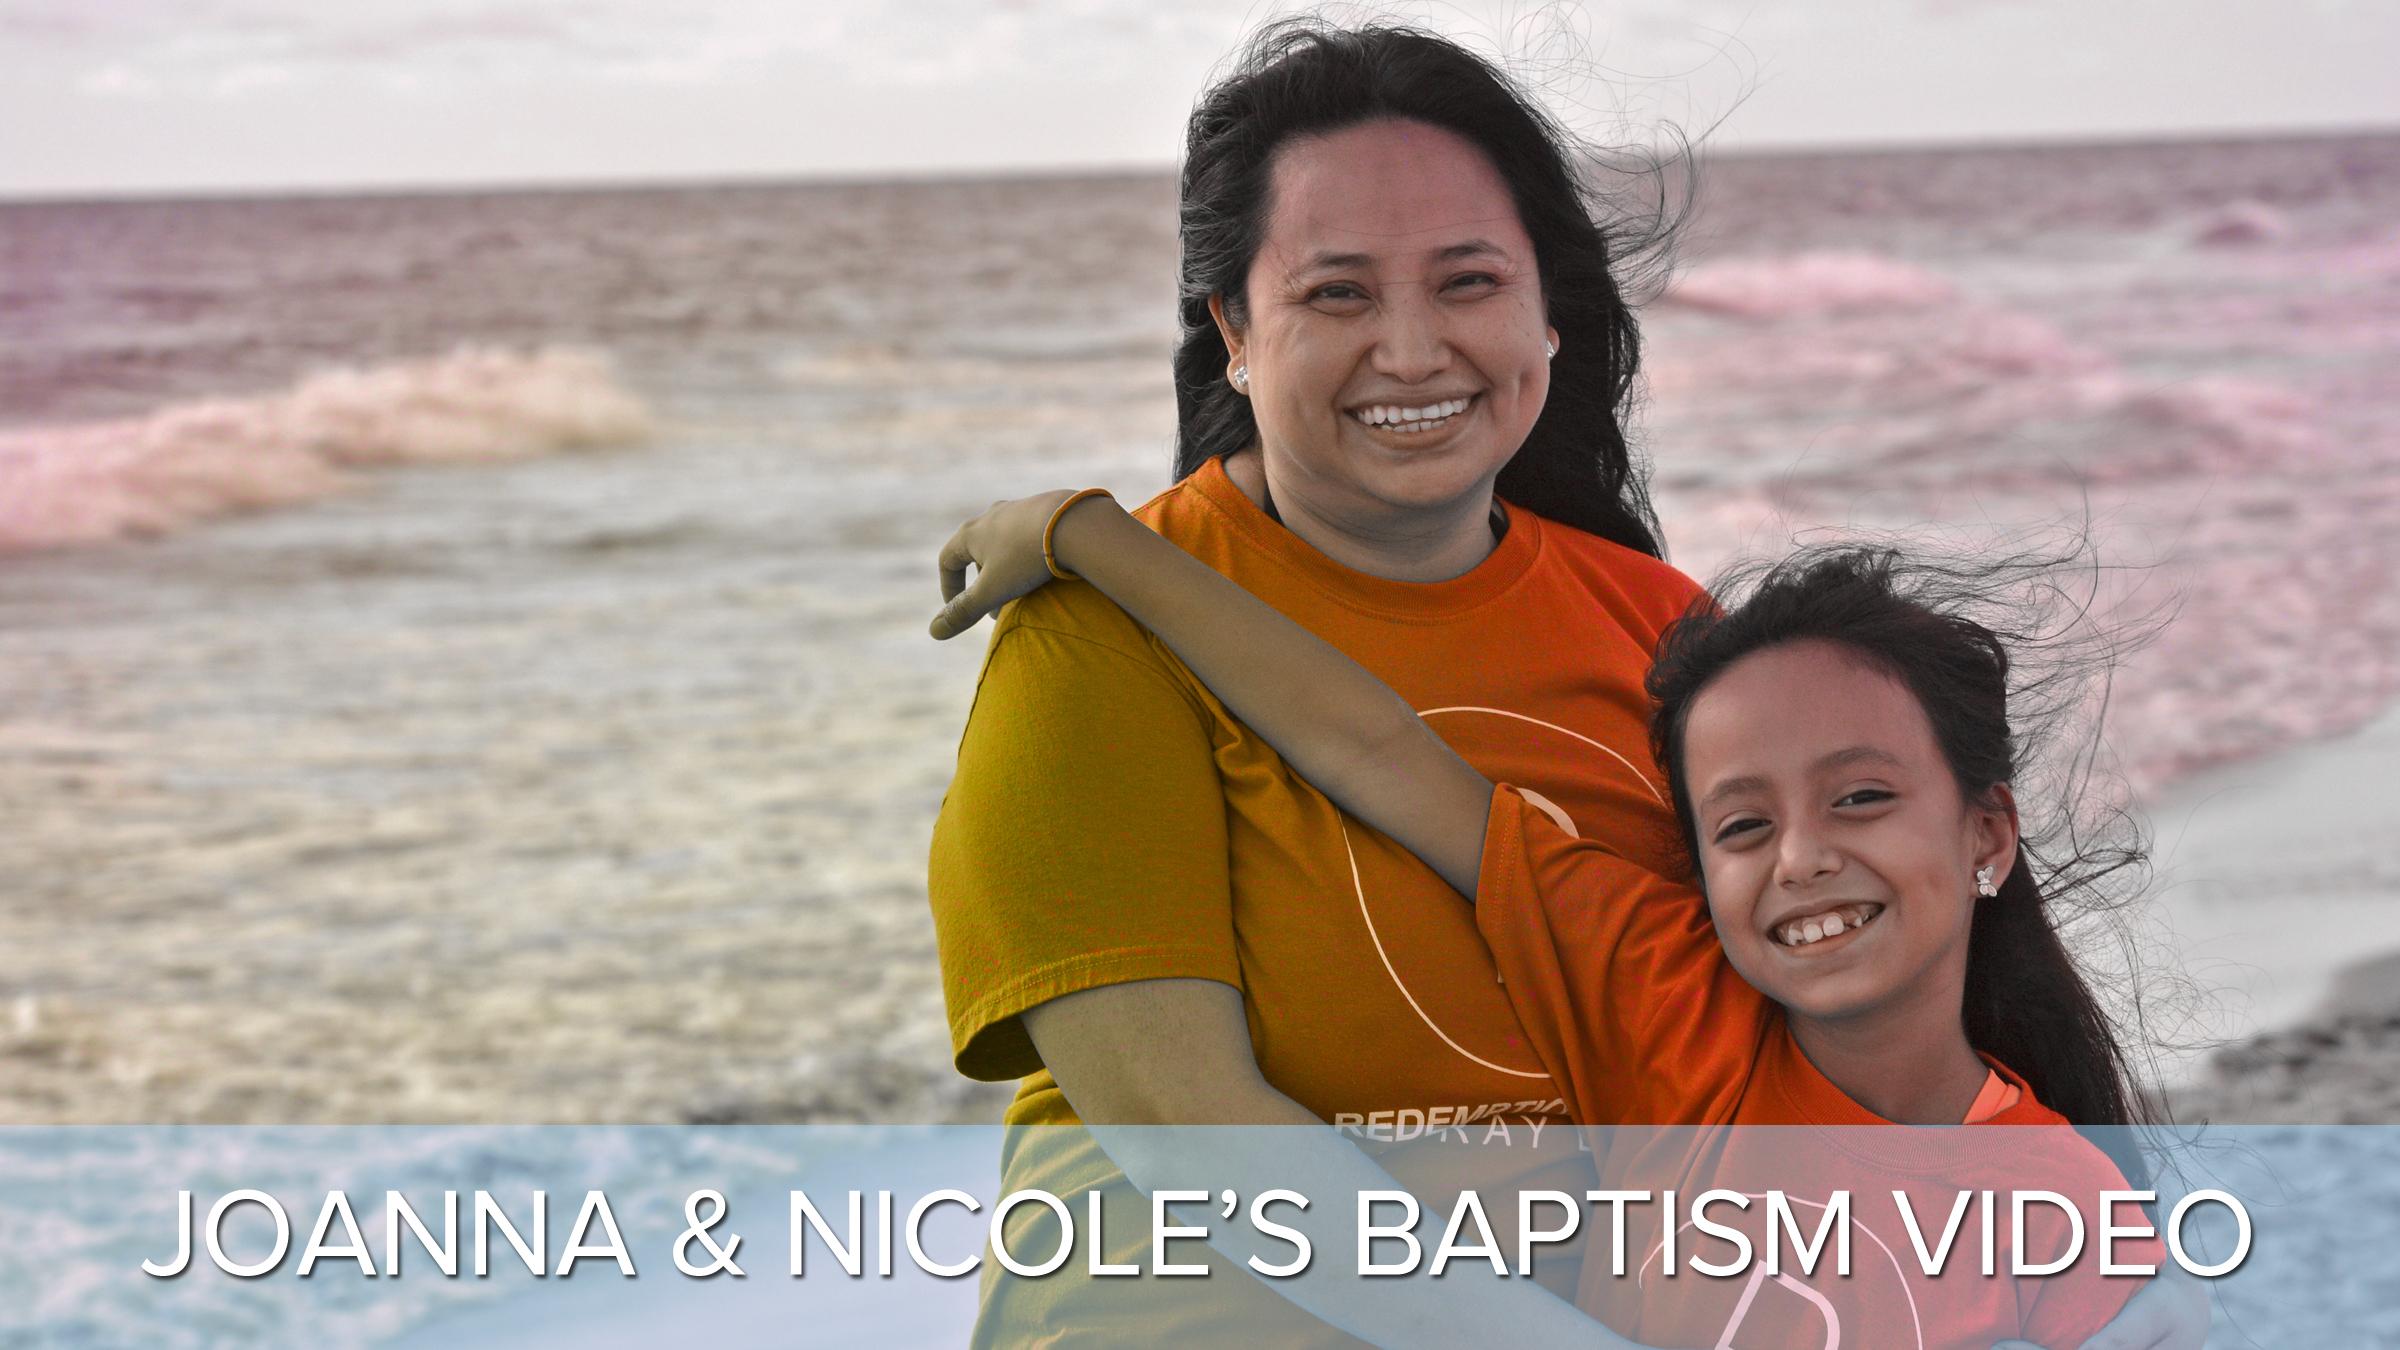 joanna and nicole's baptism video.jpg